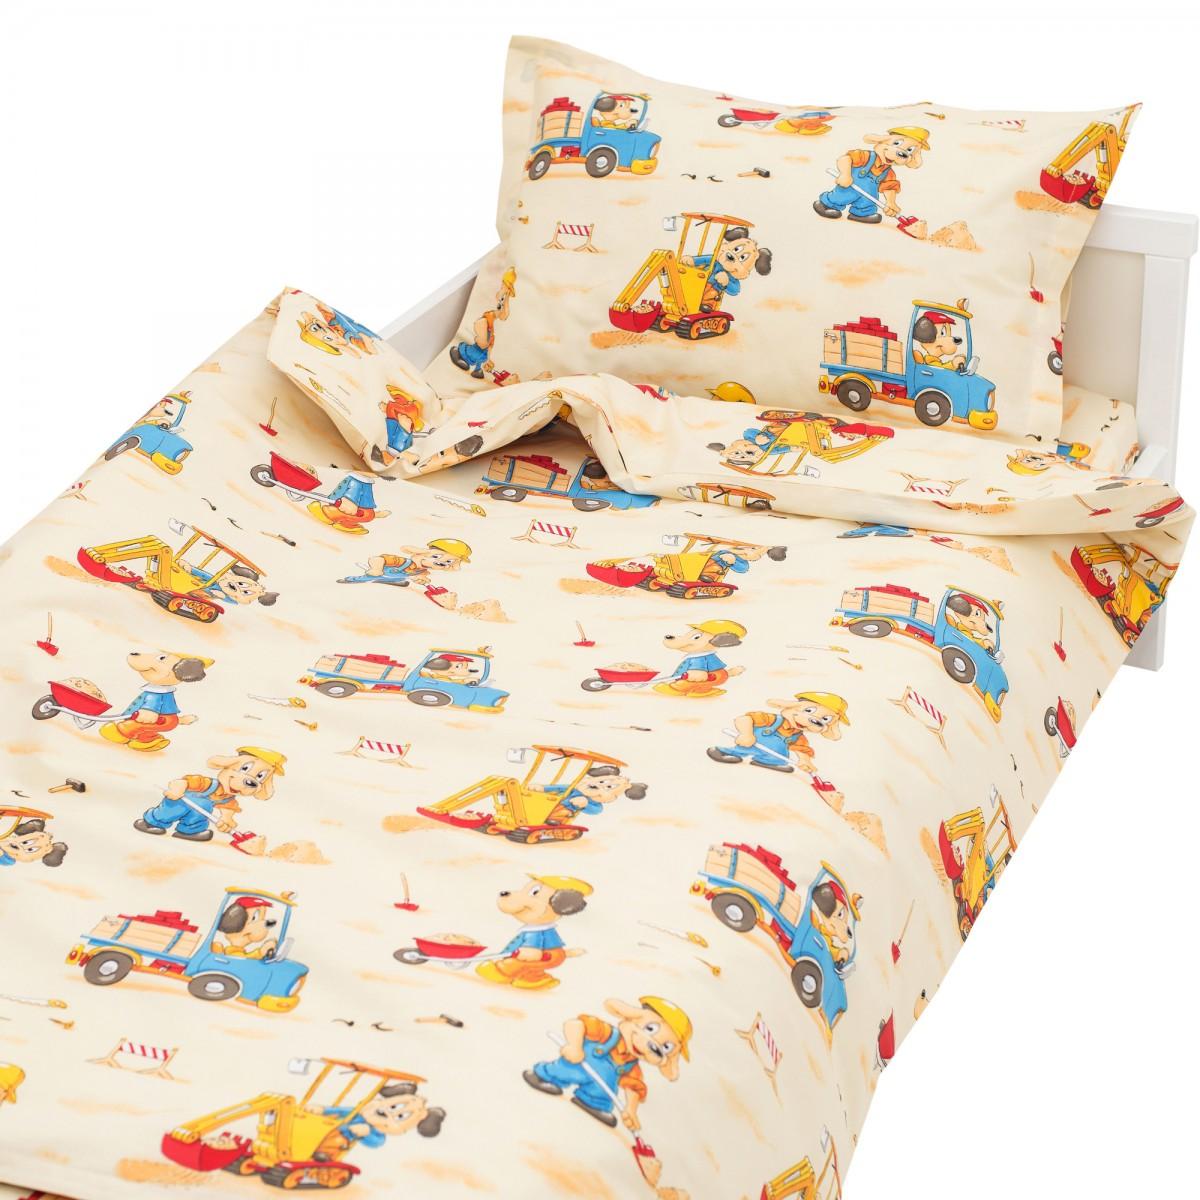 Dog baby bedding Gender neutral crib bedding Crib sheets Changing pad cover Dog nursery Dog kids bedding cot Toddler pillowcase Boppy cover